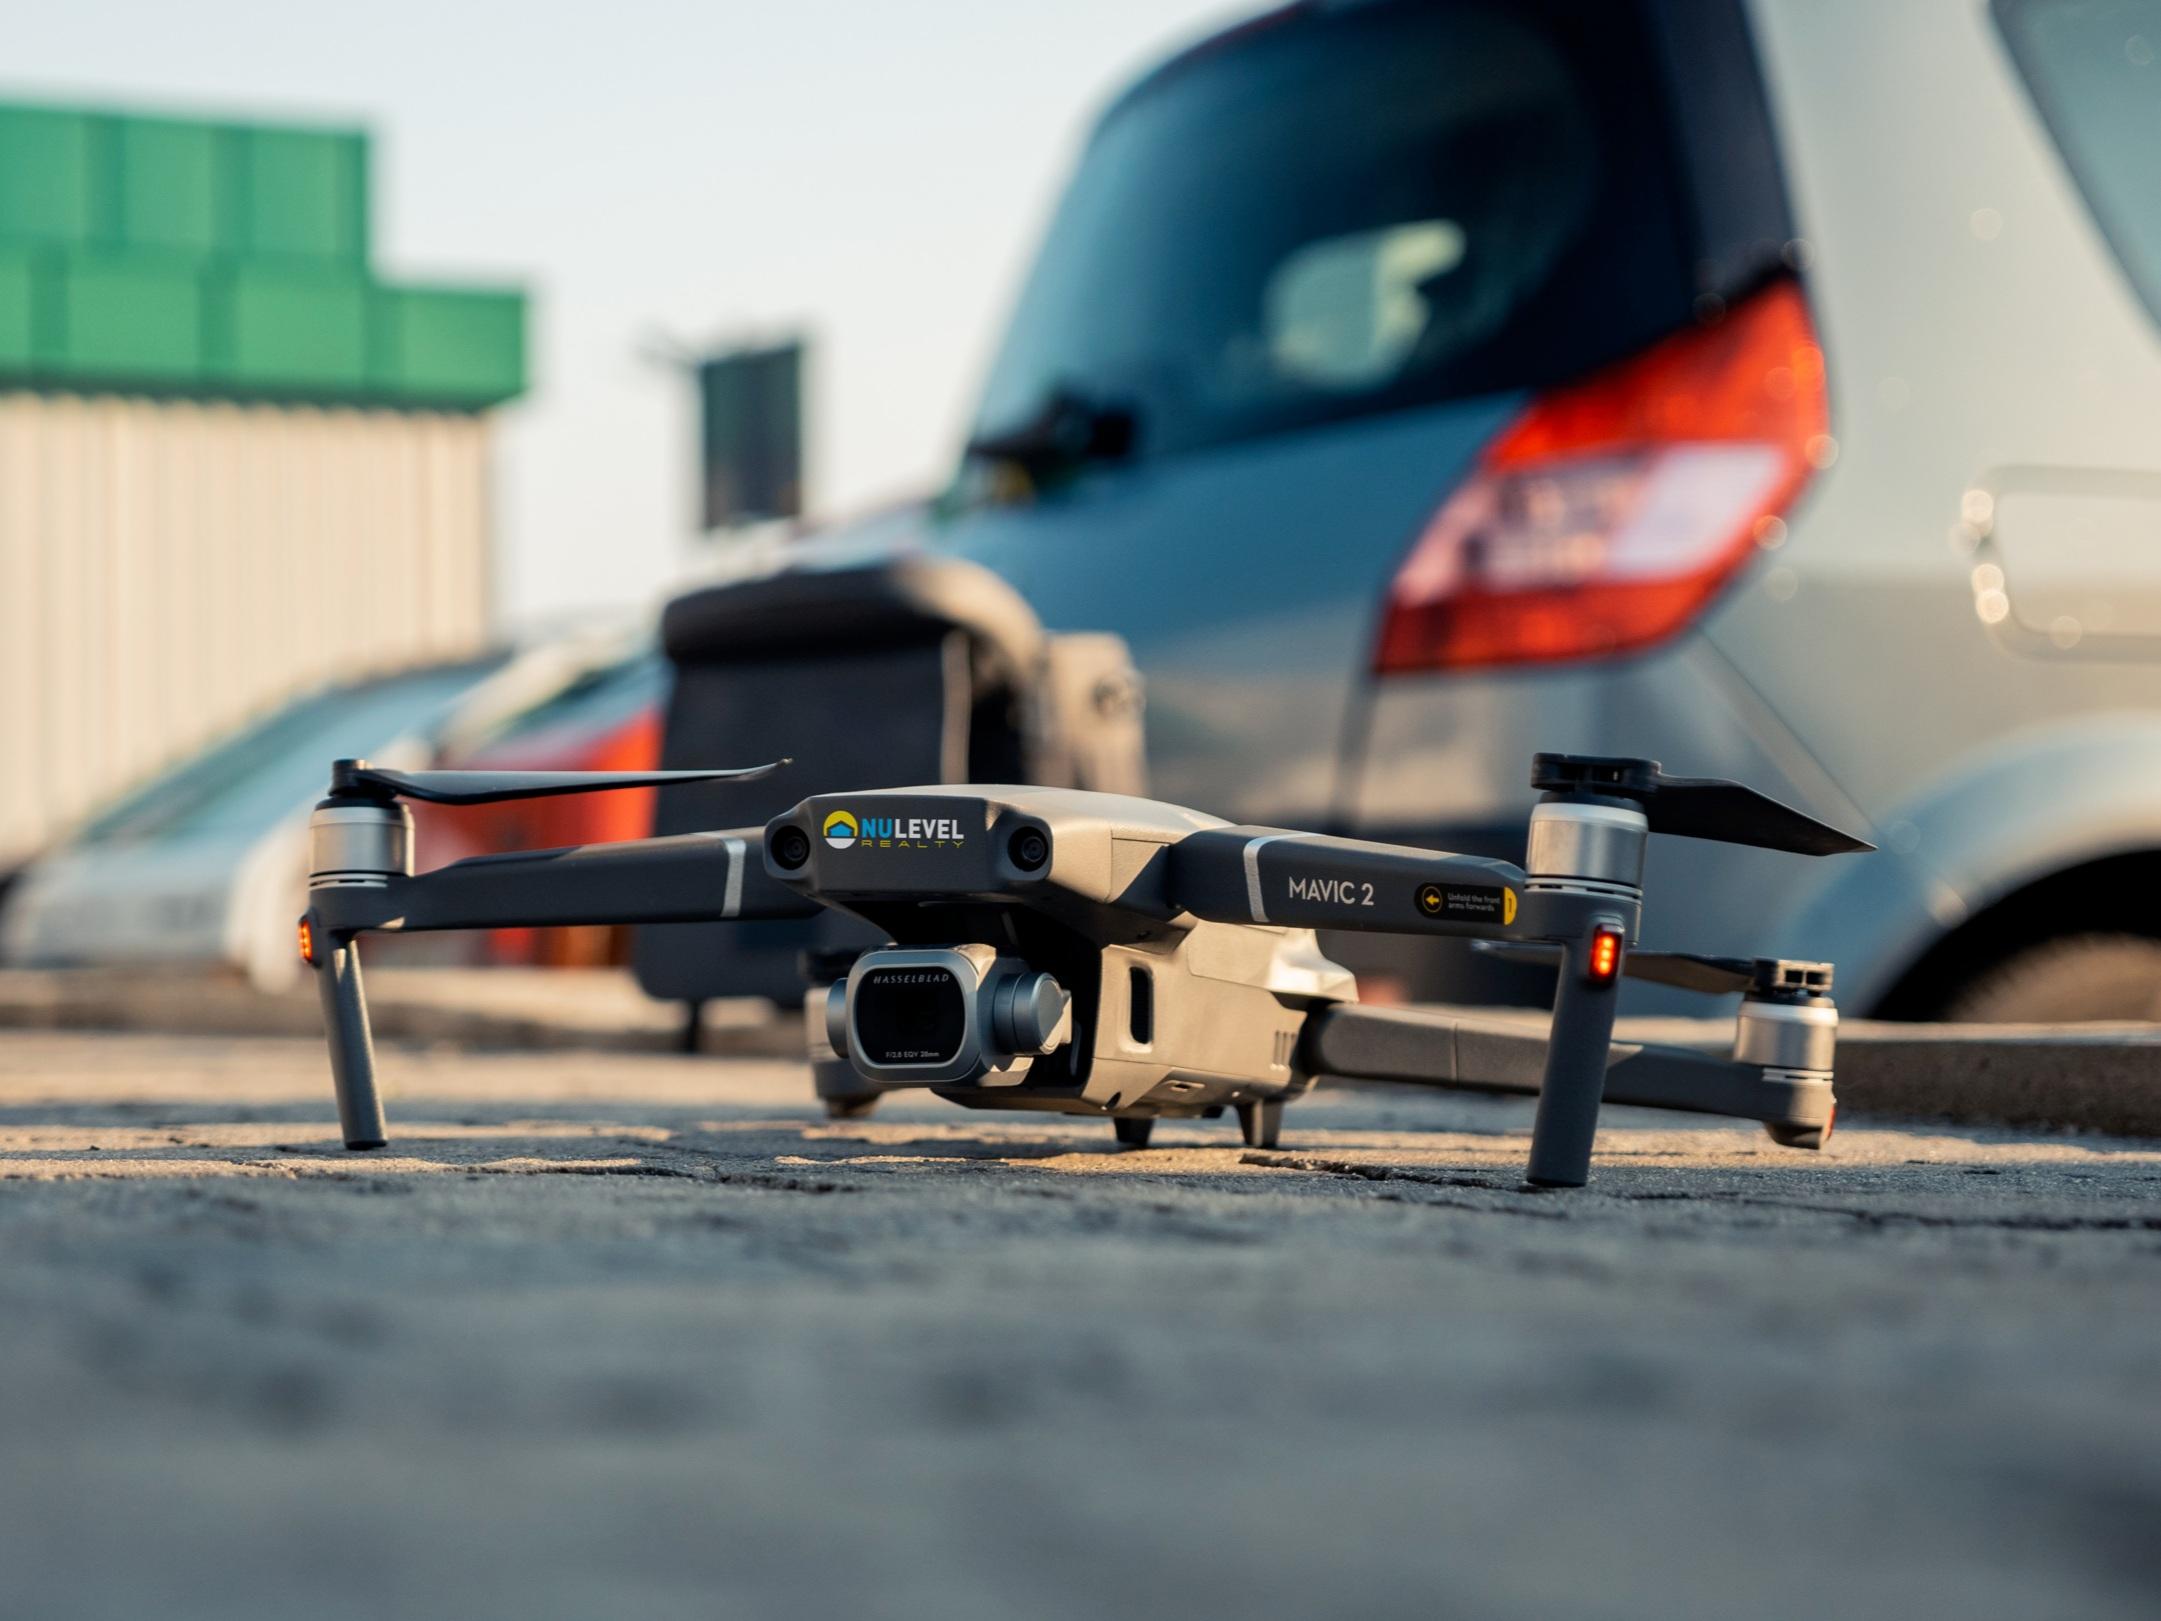 mavic+2+drone+NLE.jpg